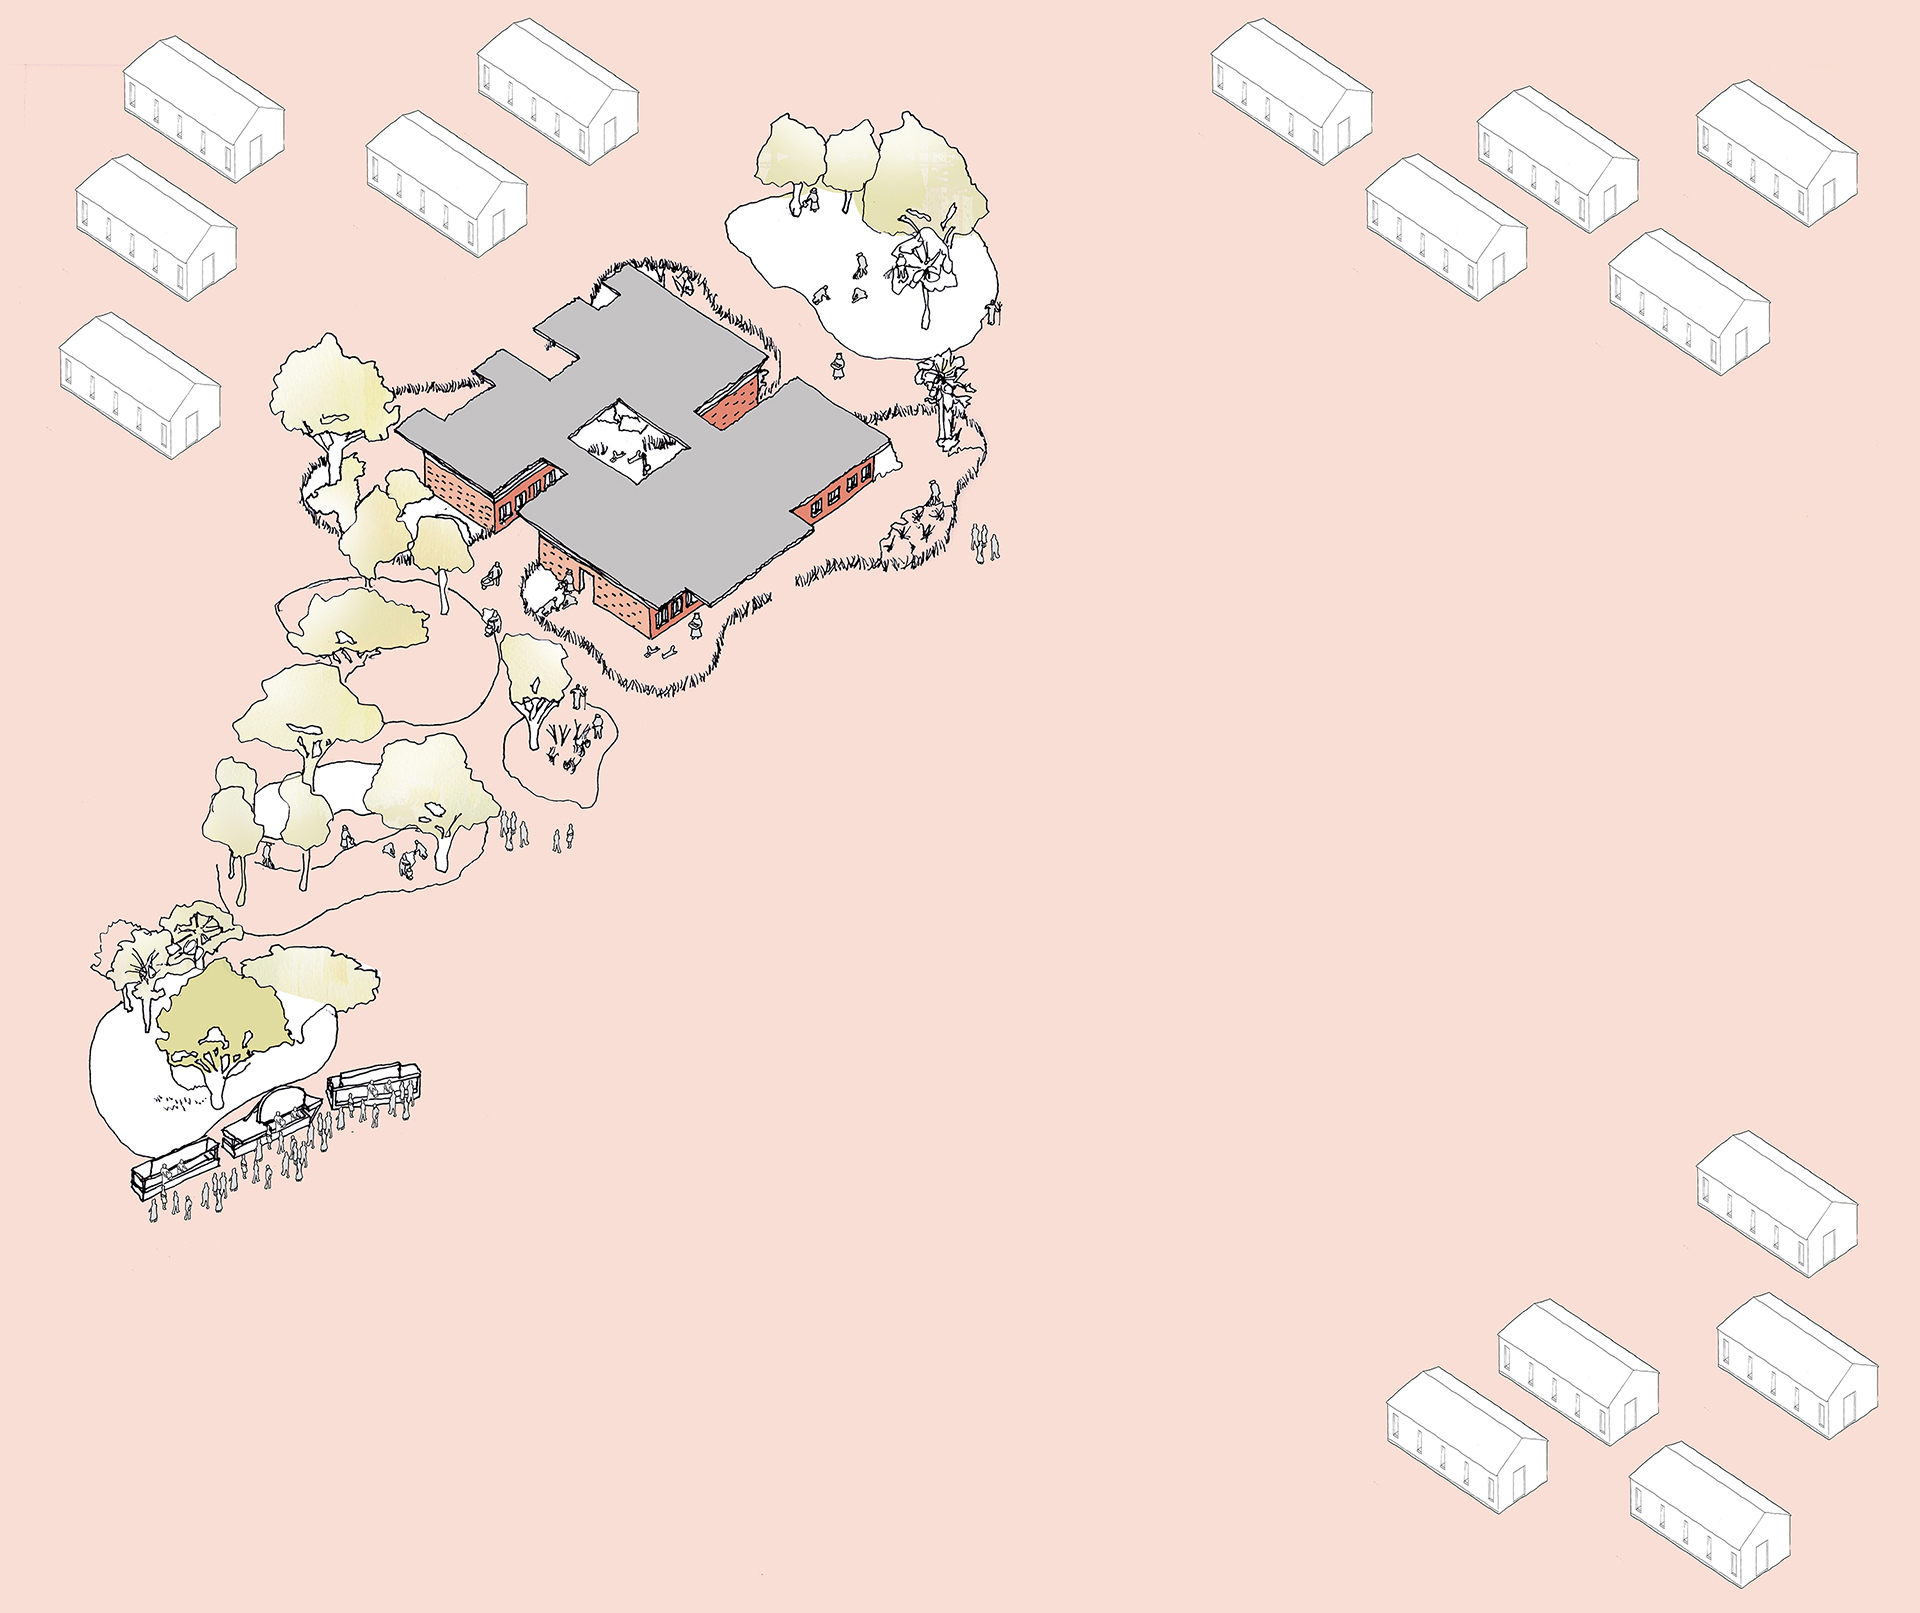 5 year plan Axonometric sketch of Modular School Concept